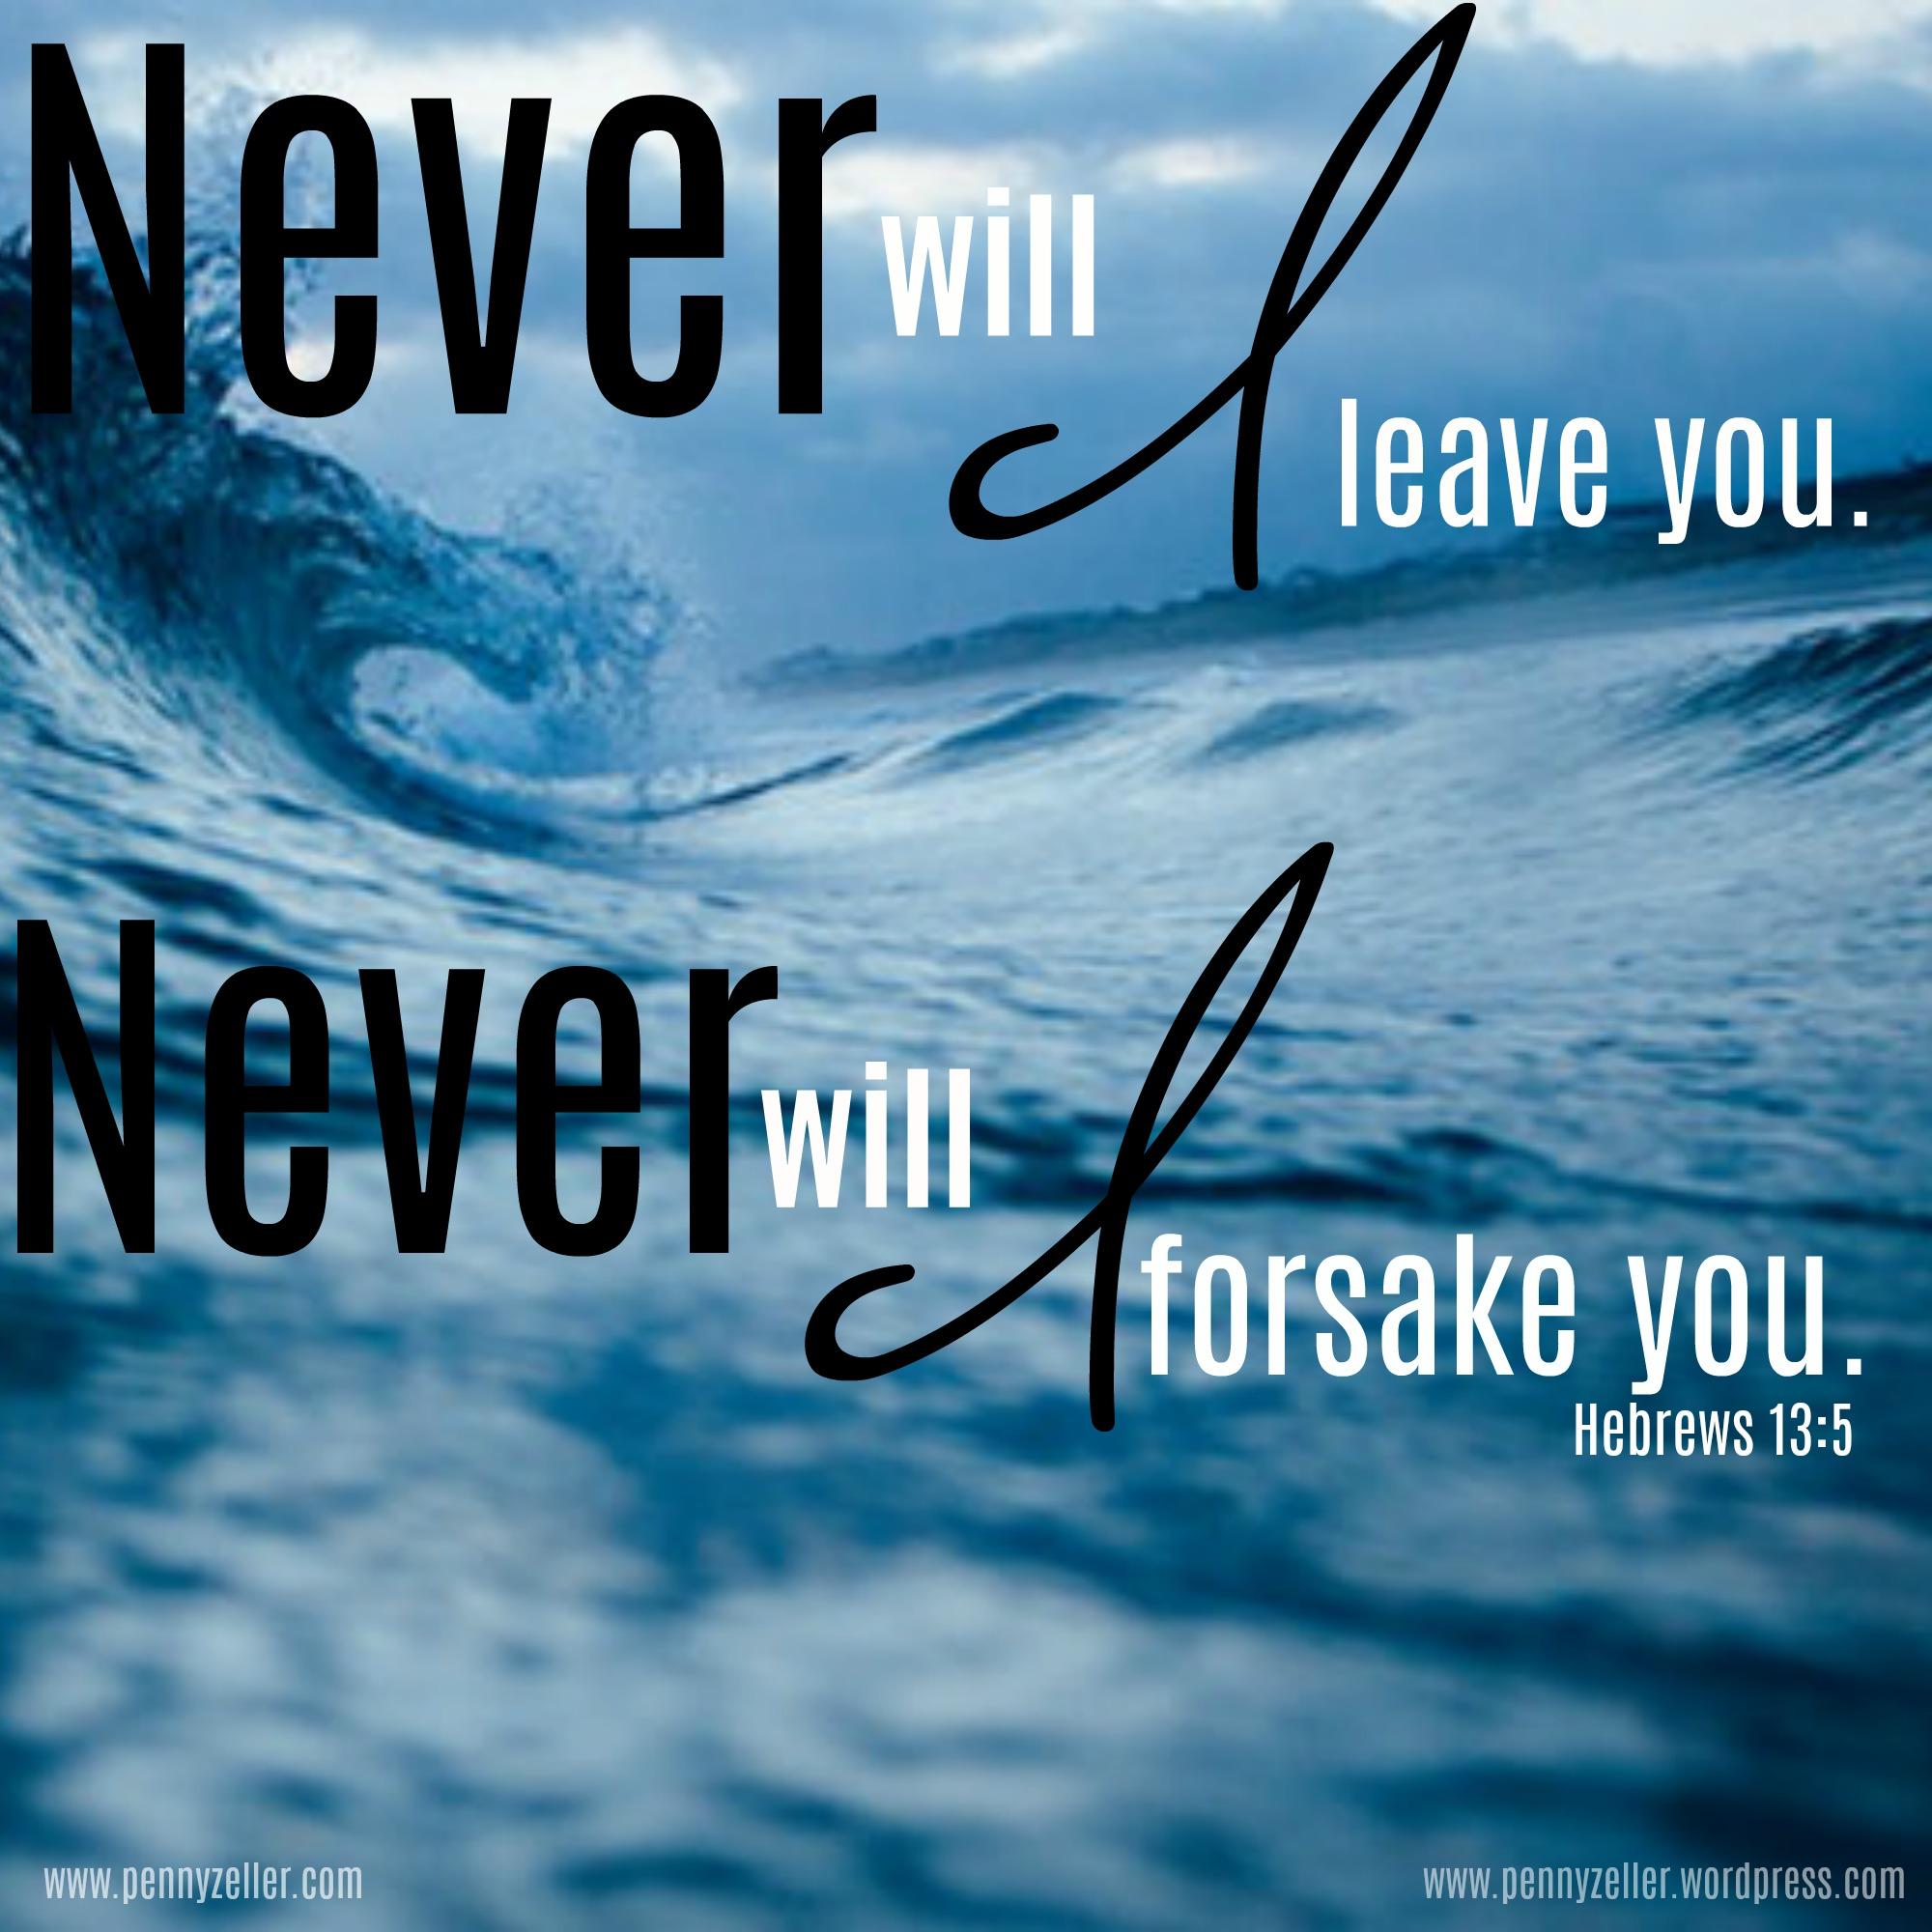 Hebrews 13 5.jpg